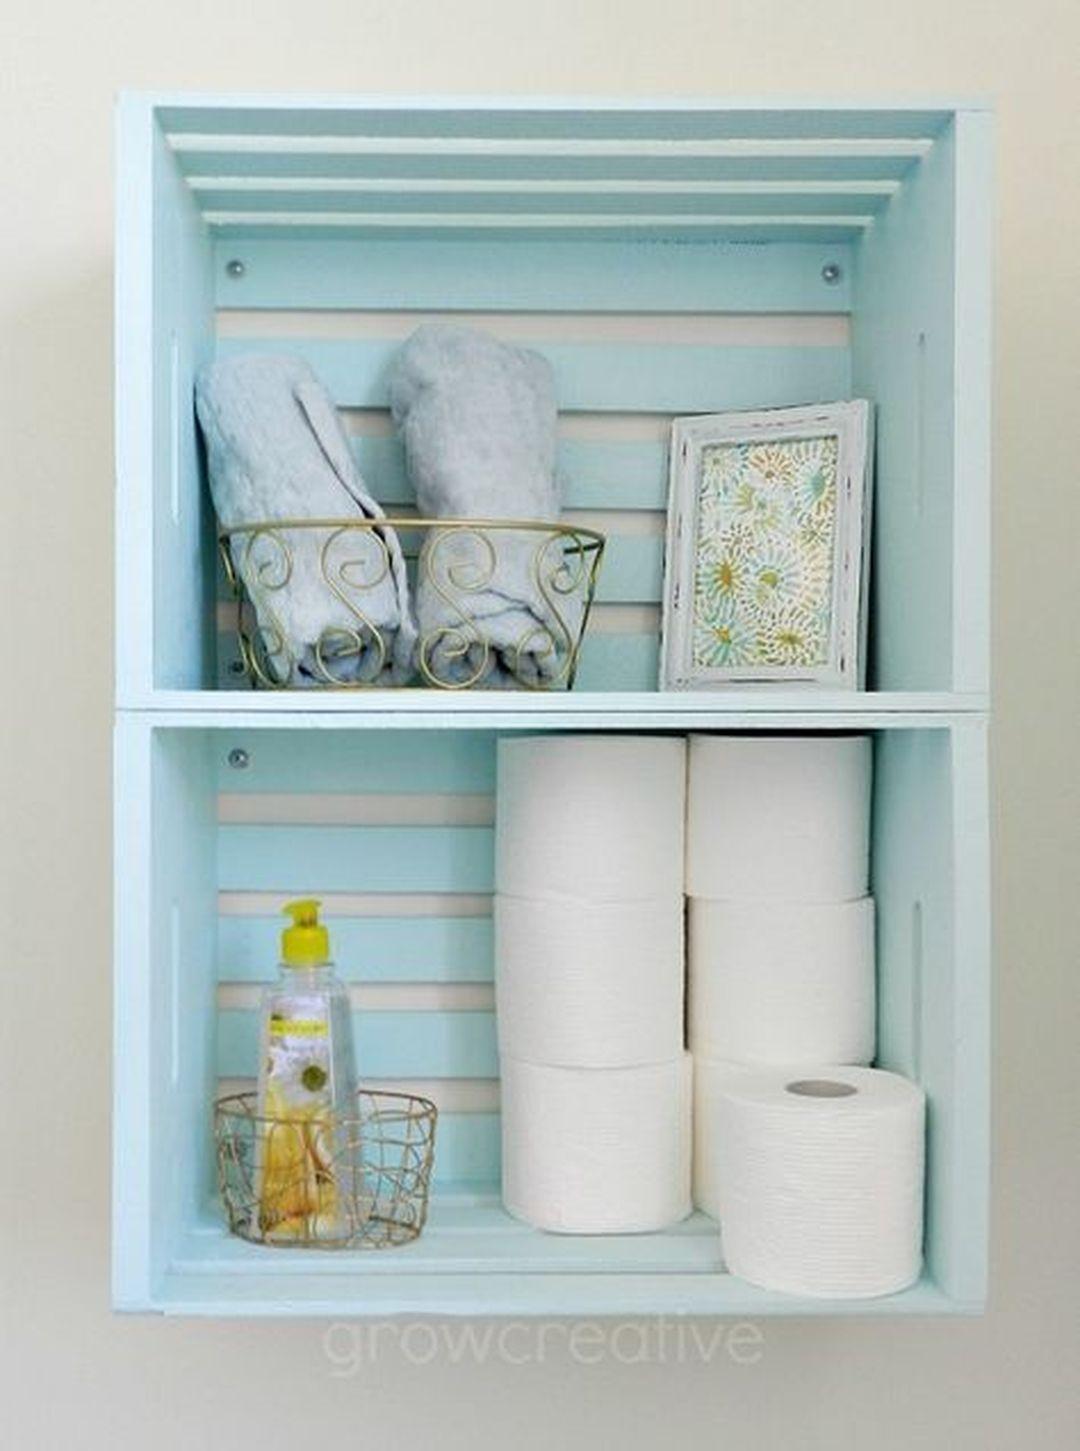 85 Smart And Easy Bathroom Storage Ideas Bathrooms Ideas inside measurements 1080 X 1451